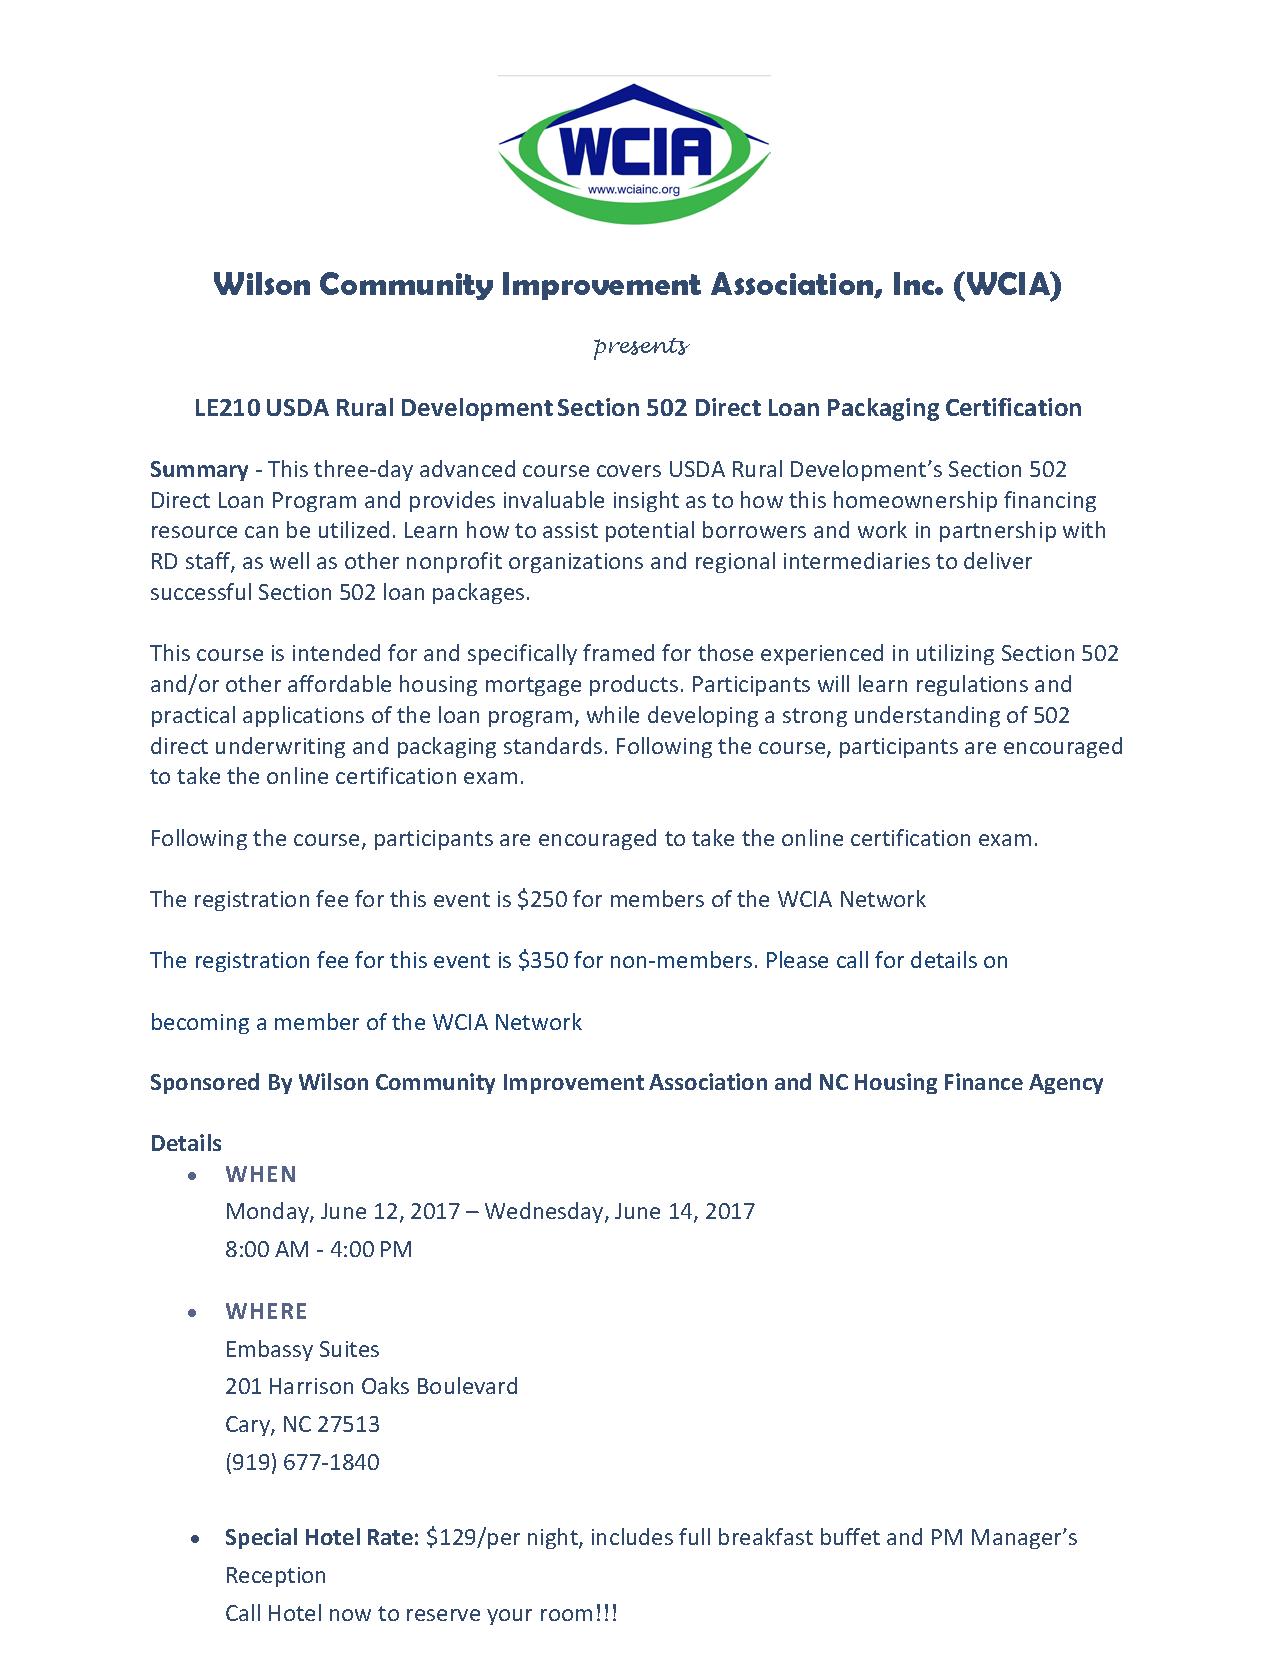 Rural Home Loans (USDA) - Wilson Community Improvement Association ...